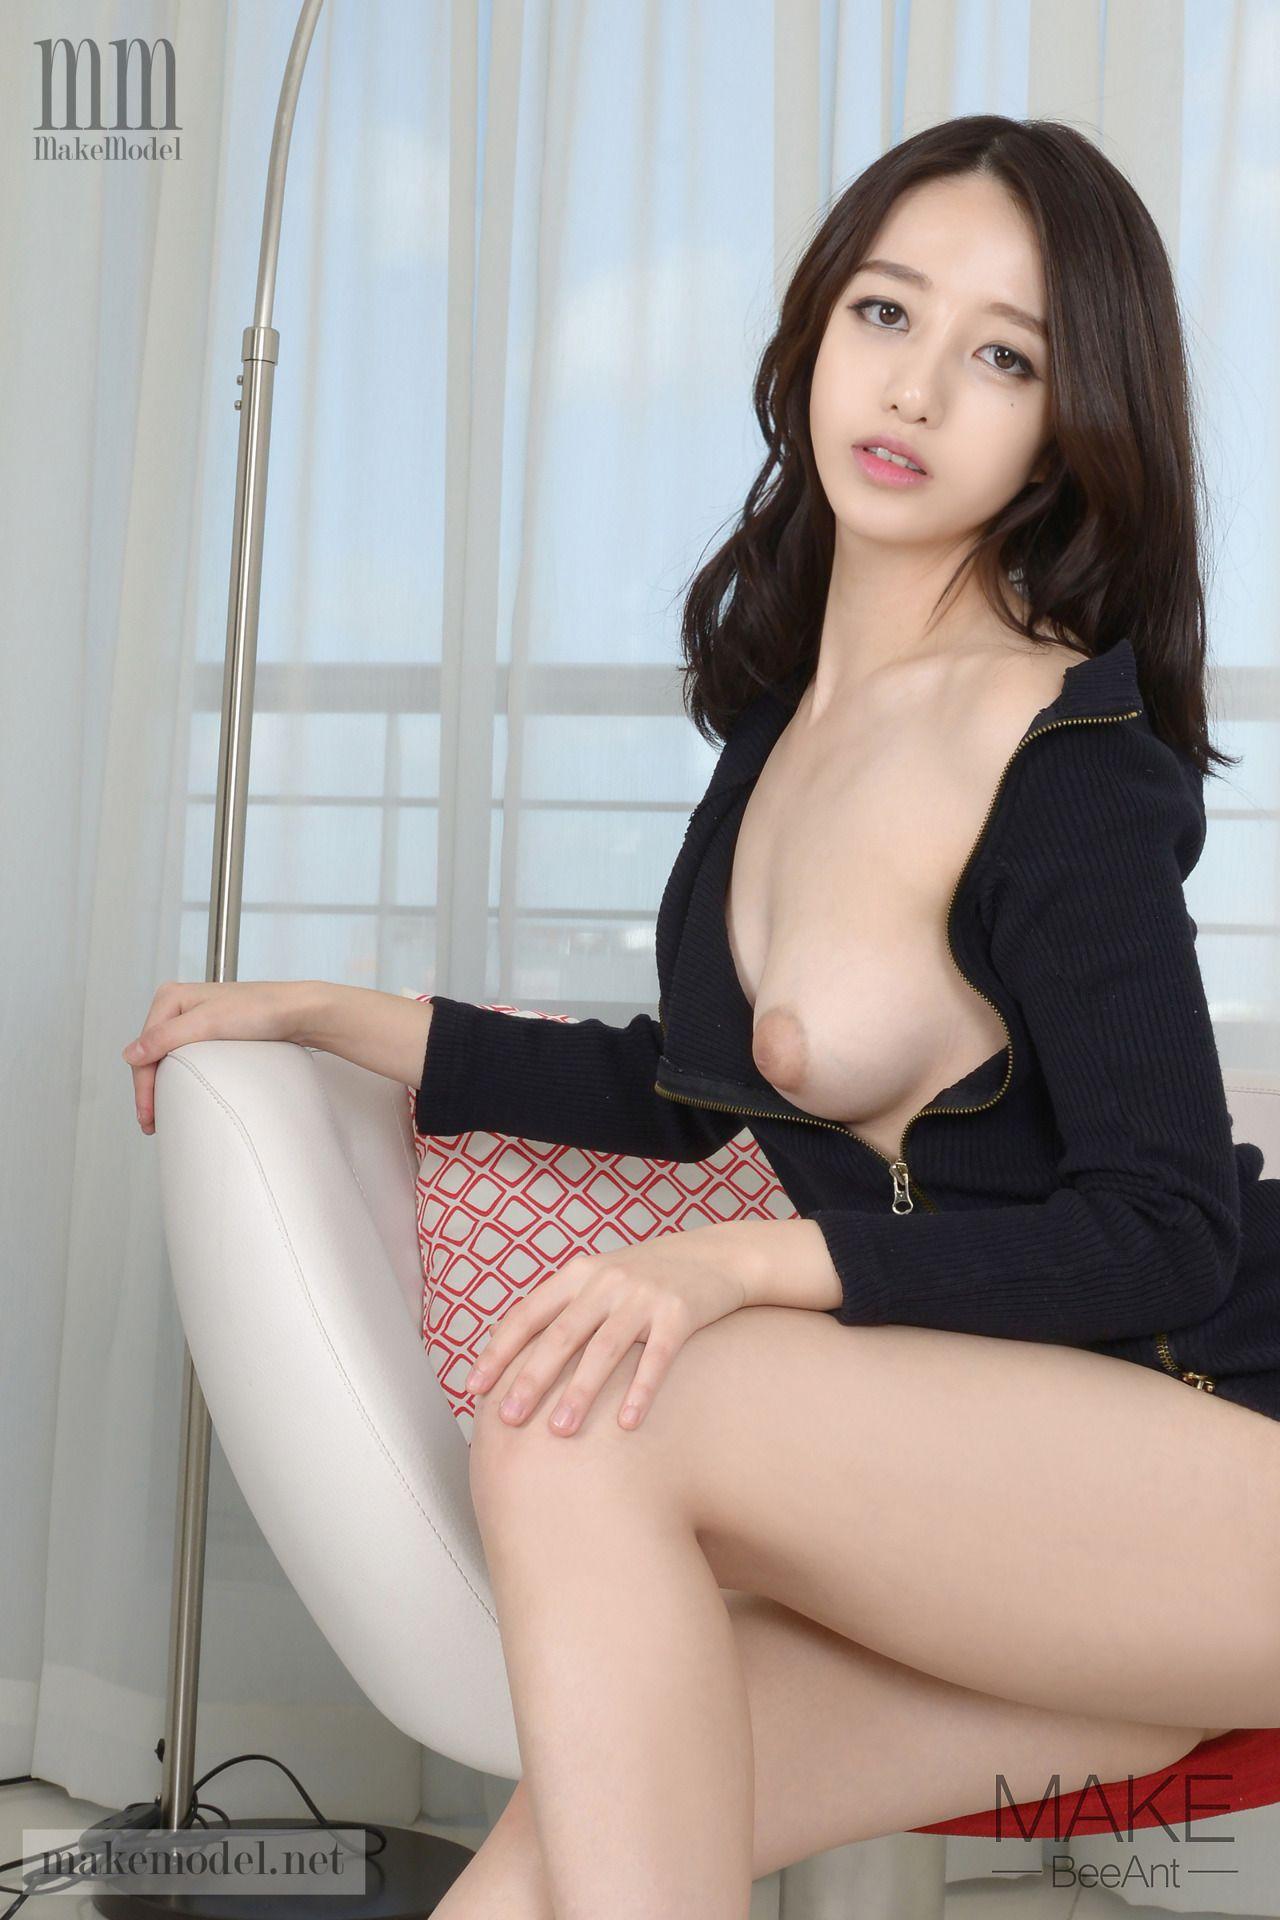 makemodel수아누드' Pin by 吃吃吃 on makemodel sua | Pinterest | メイク モデル, 美 and モデル